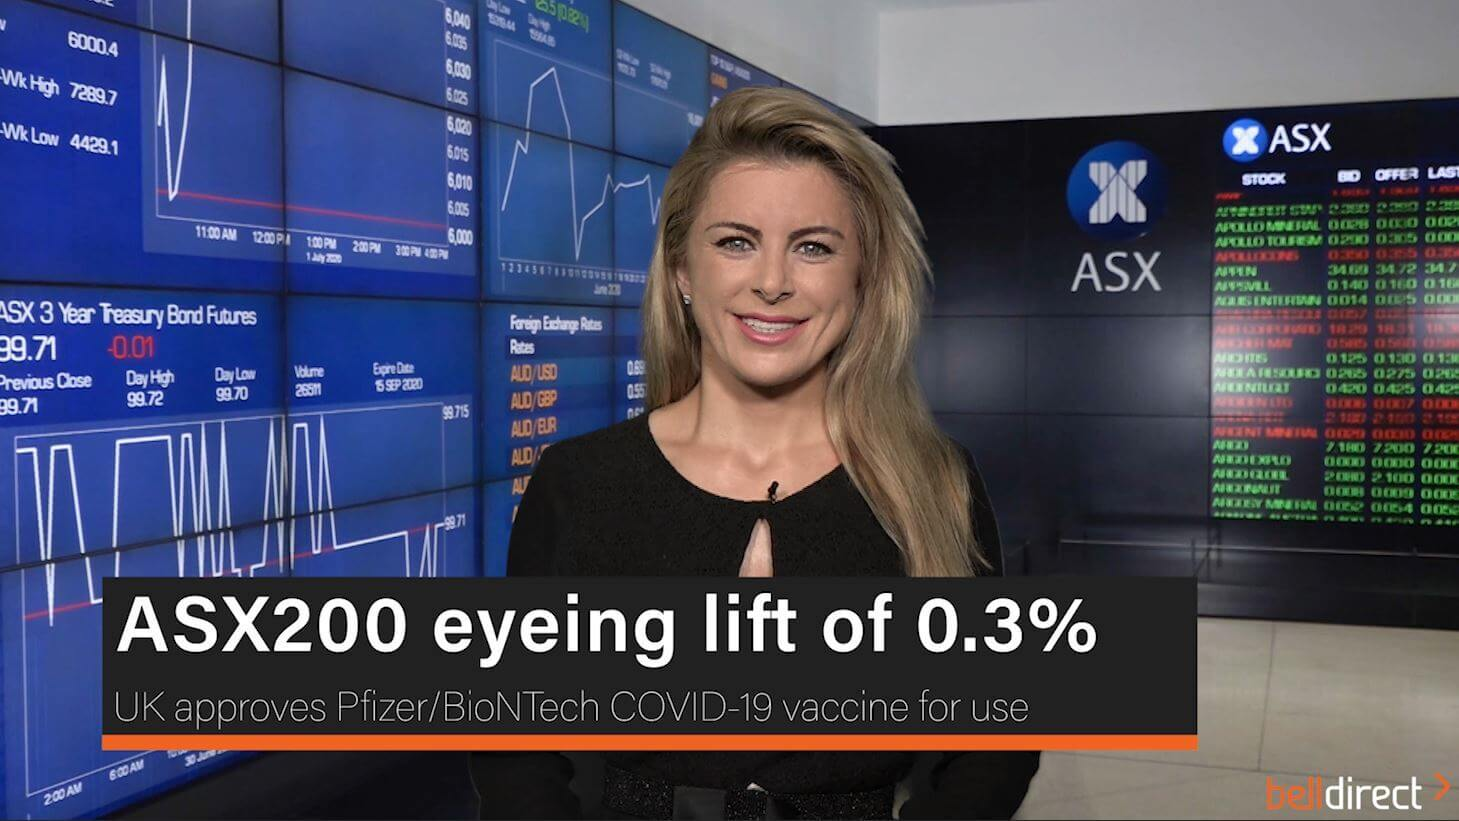 ASX200 eyeing lift of 0.3%